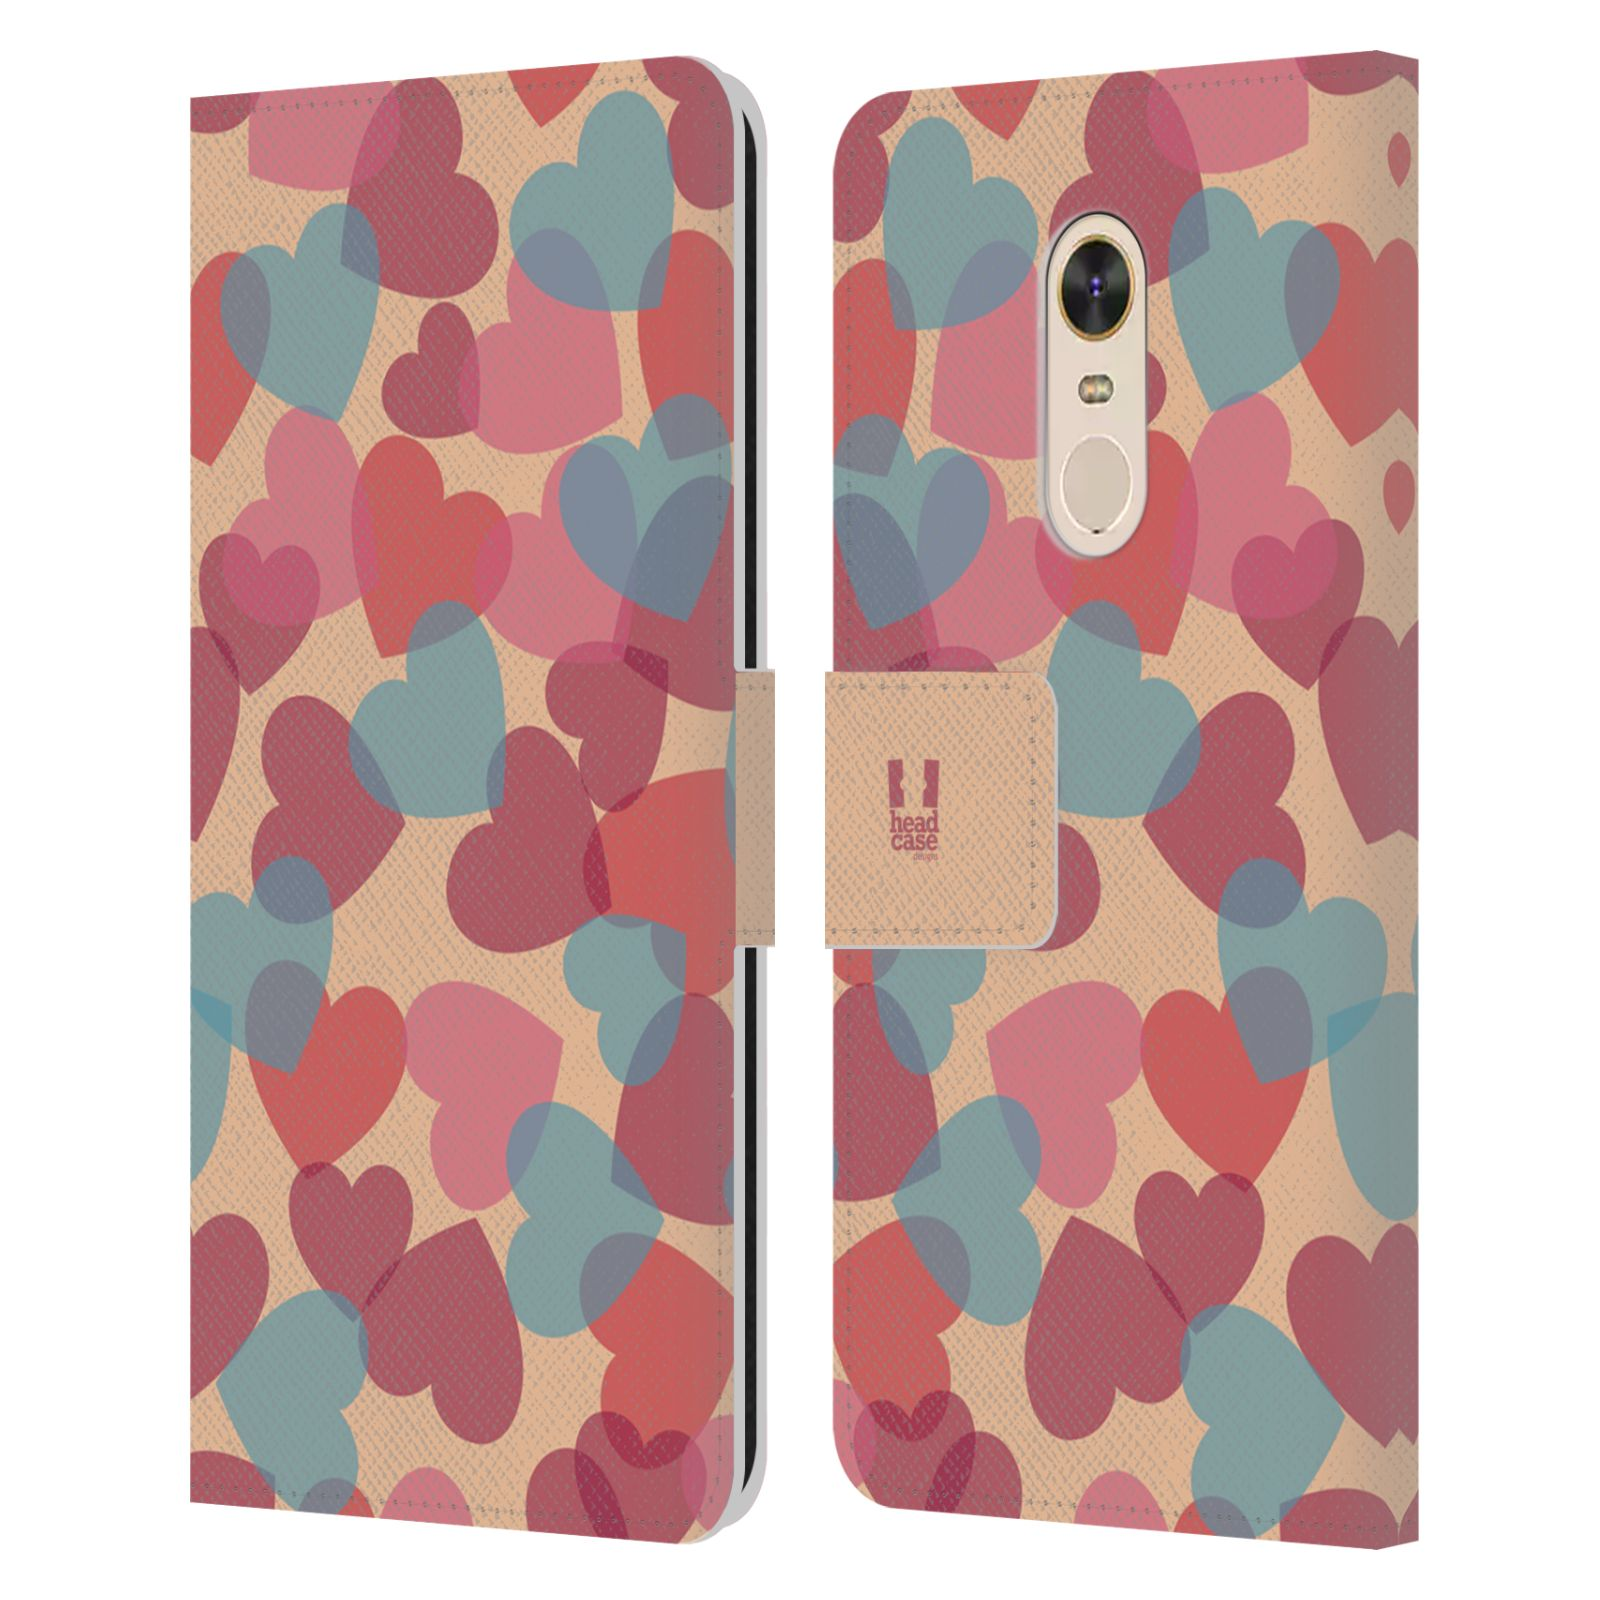 HEAD CASE Flipové pouzdro pro mobil Xiaomi Redmi Note 5 vzor prolínající se srdíčka, srdce, láska, růžová